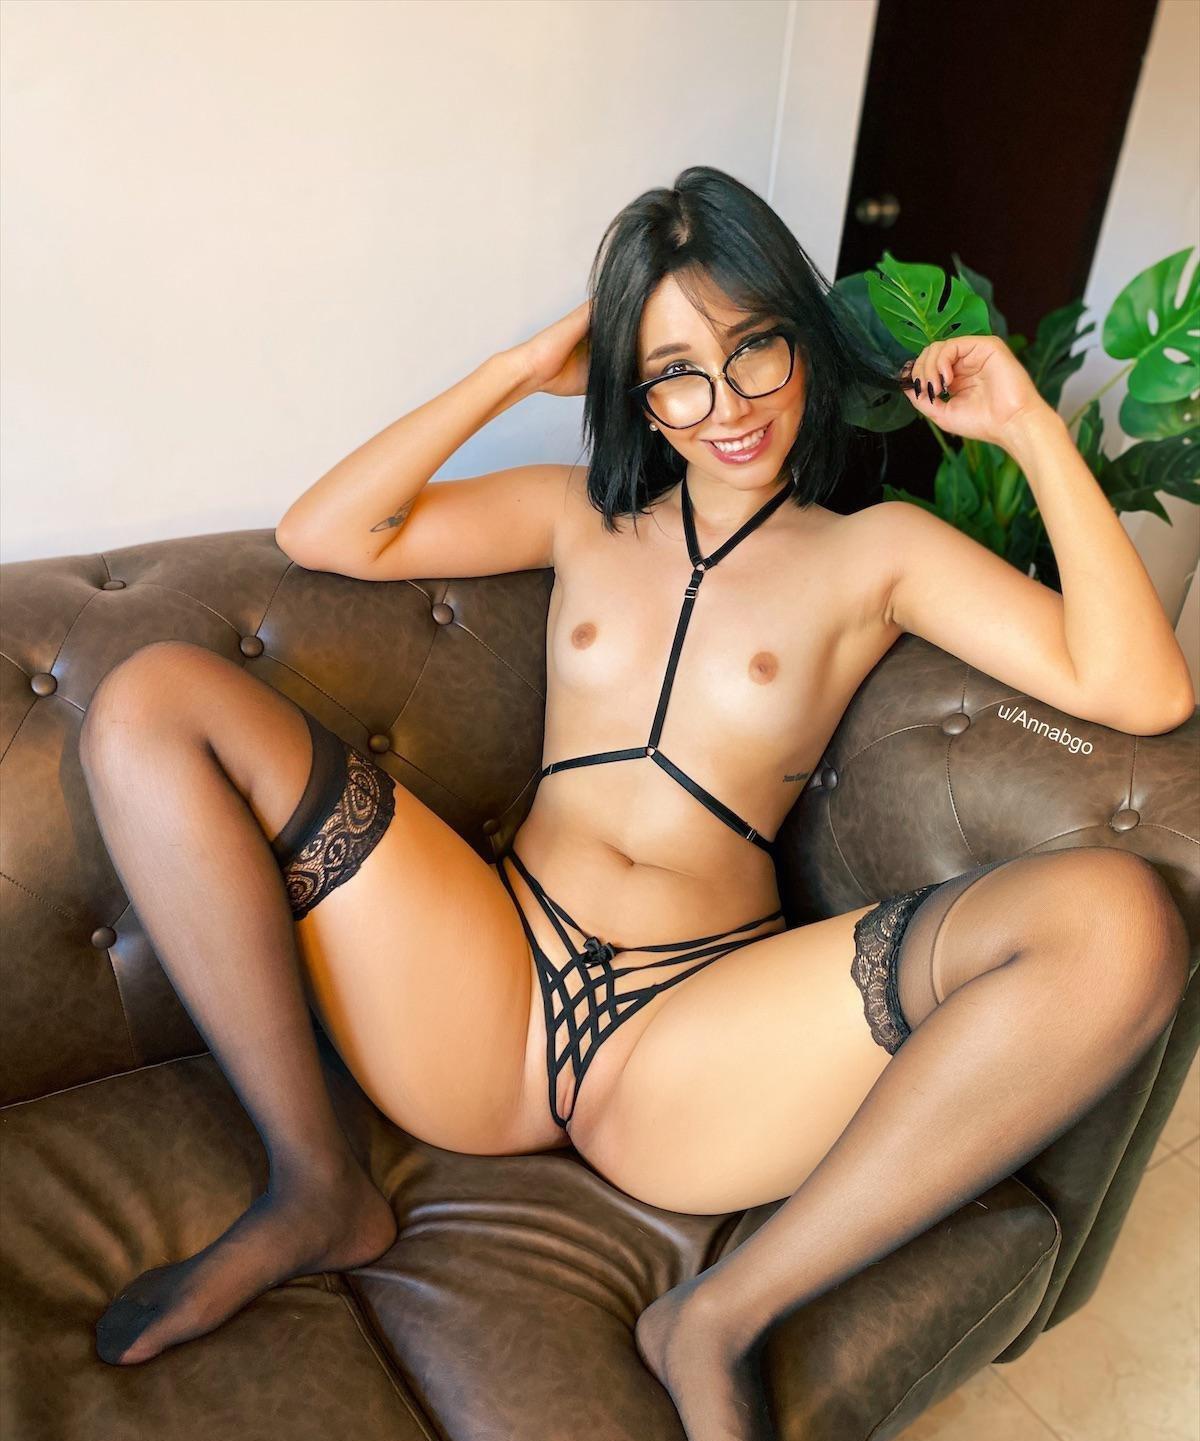 Annabgo Annabeggion Onlyfans Nude Leaks 0020